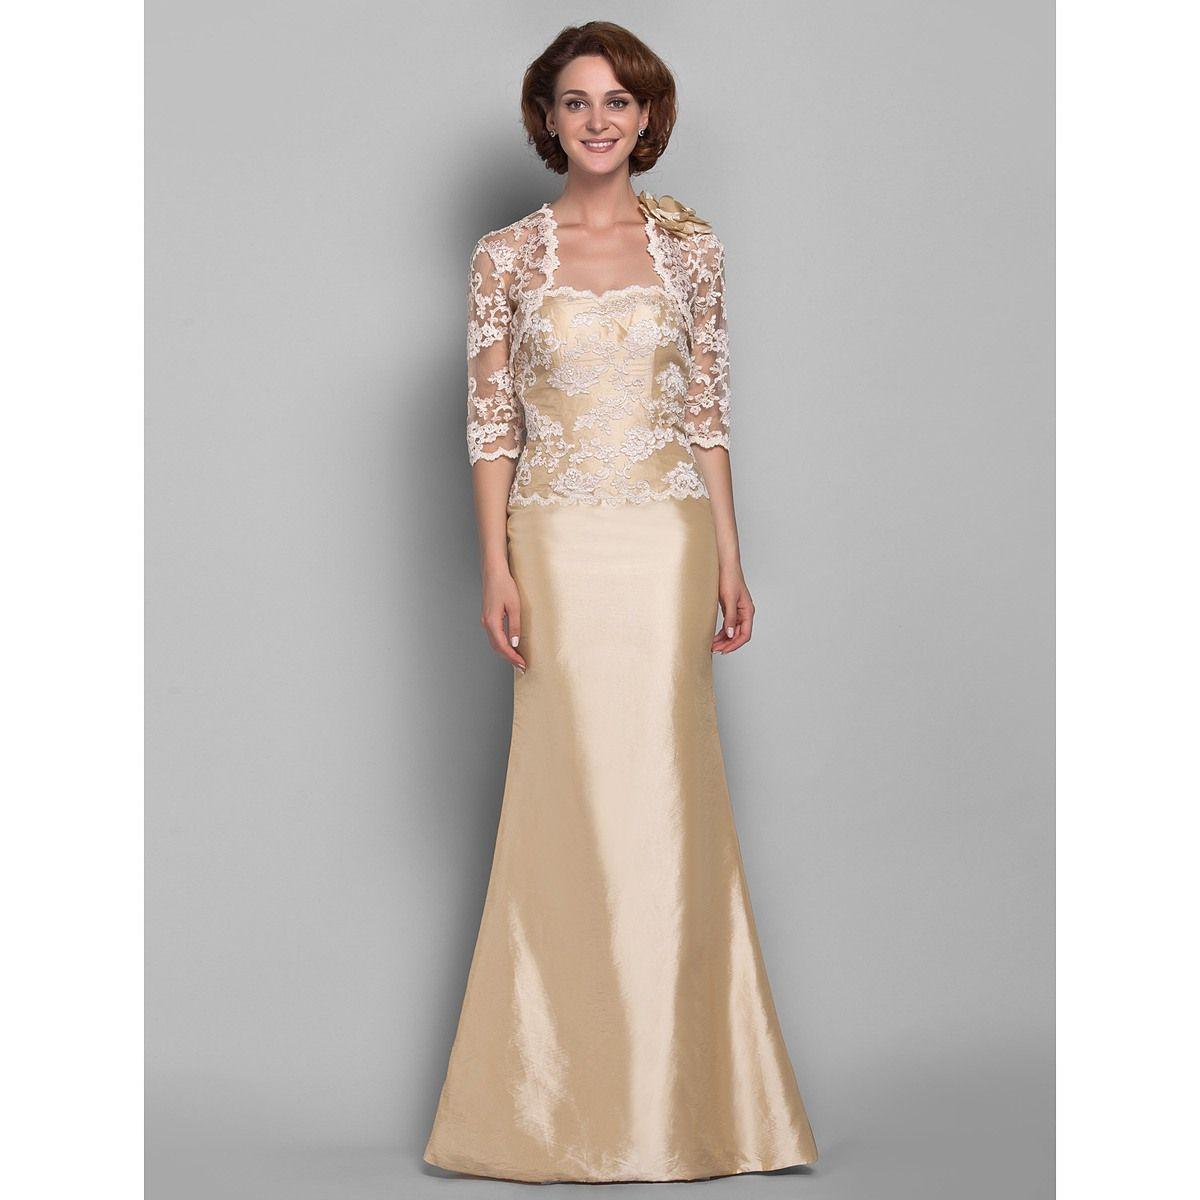 Light up wedding dress  TrumpetMermaid Sweetheart Floorlength Taffeta And Lace Mother of